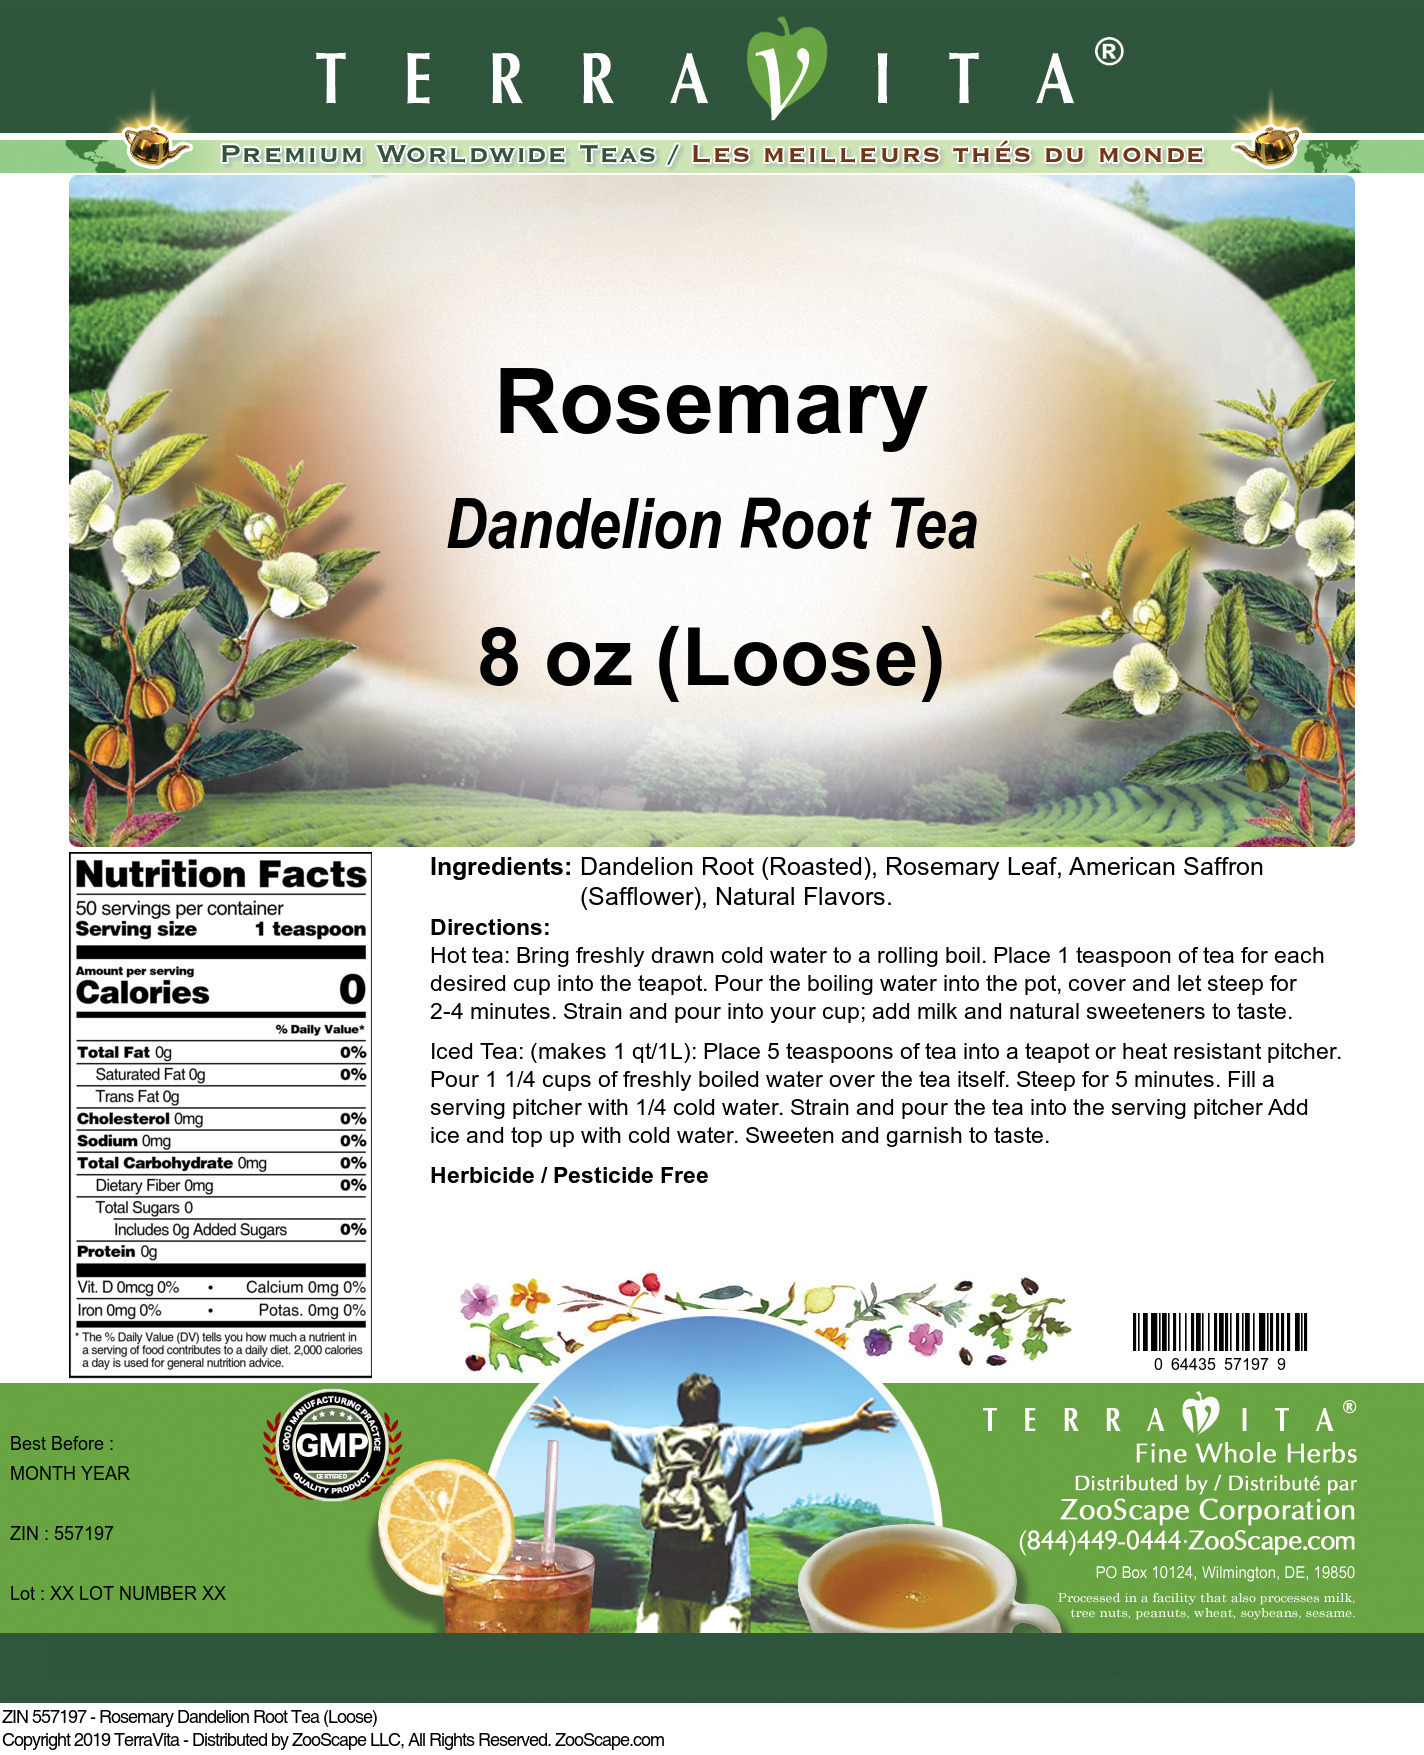 Rosemary Dandelion Root Tea (Loose)